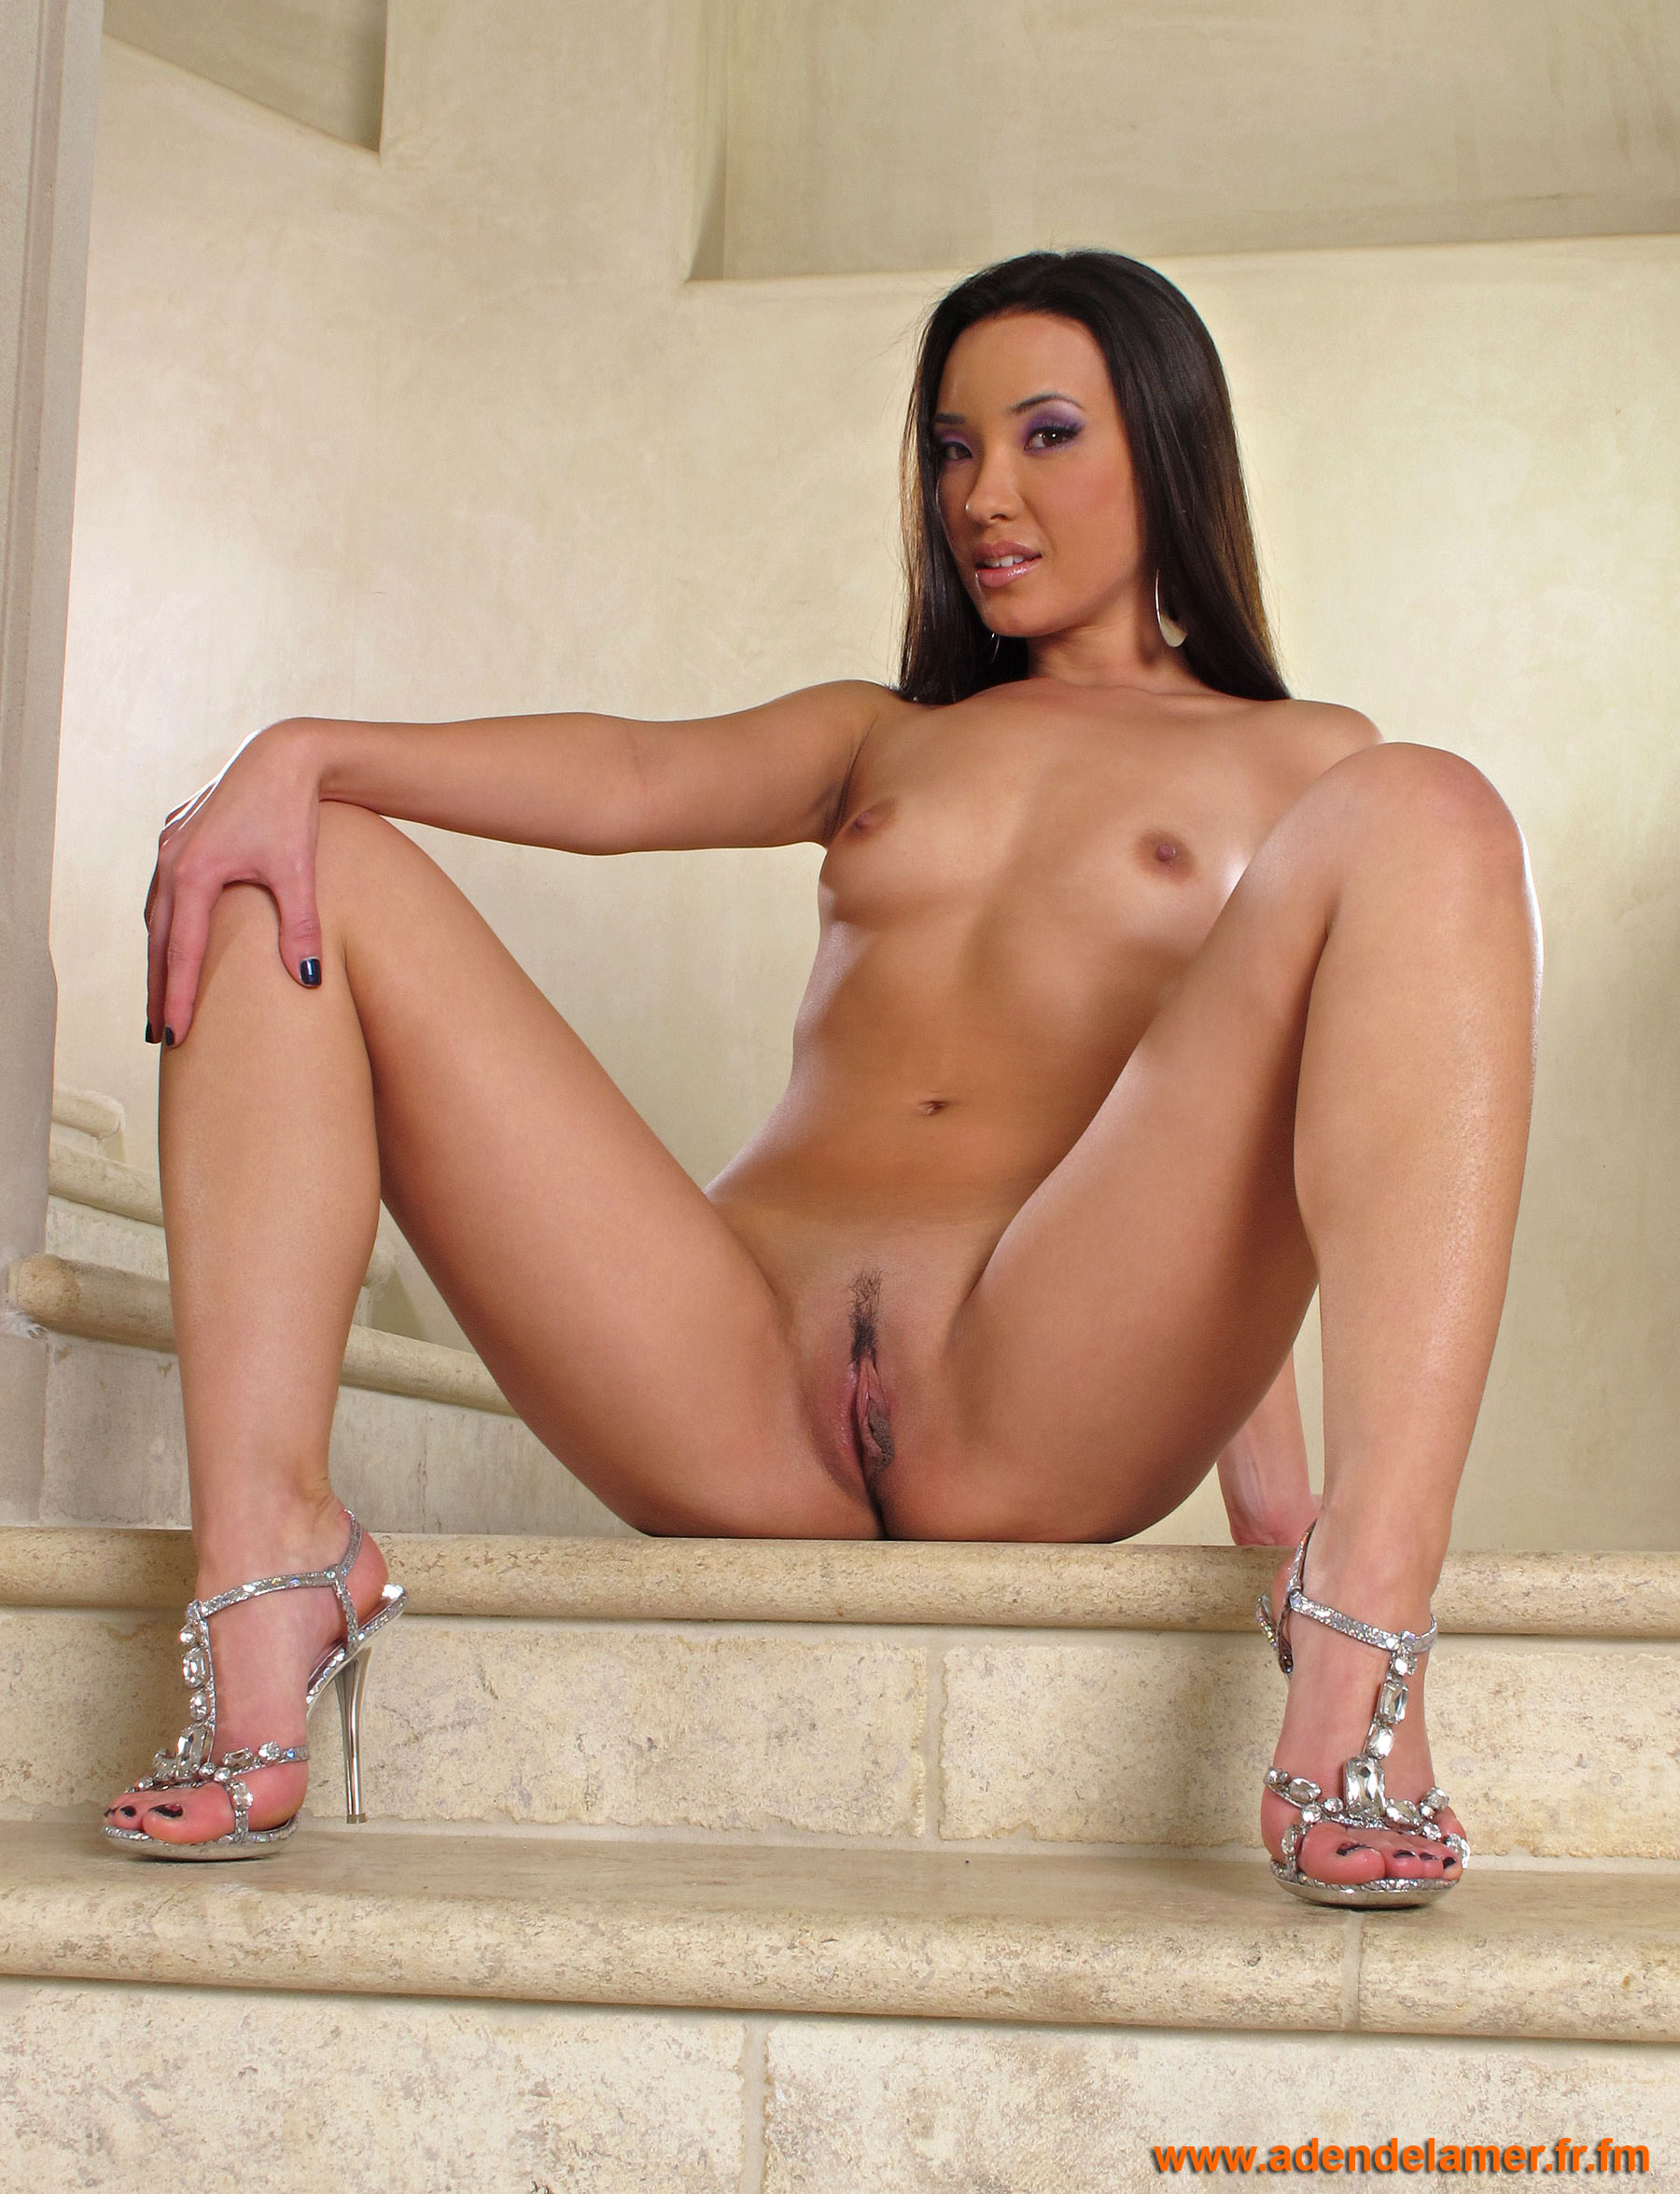 Miko sins nude erotic scenes